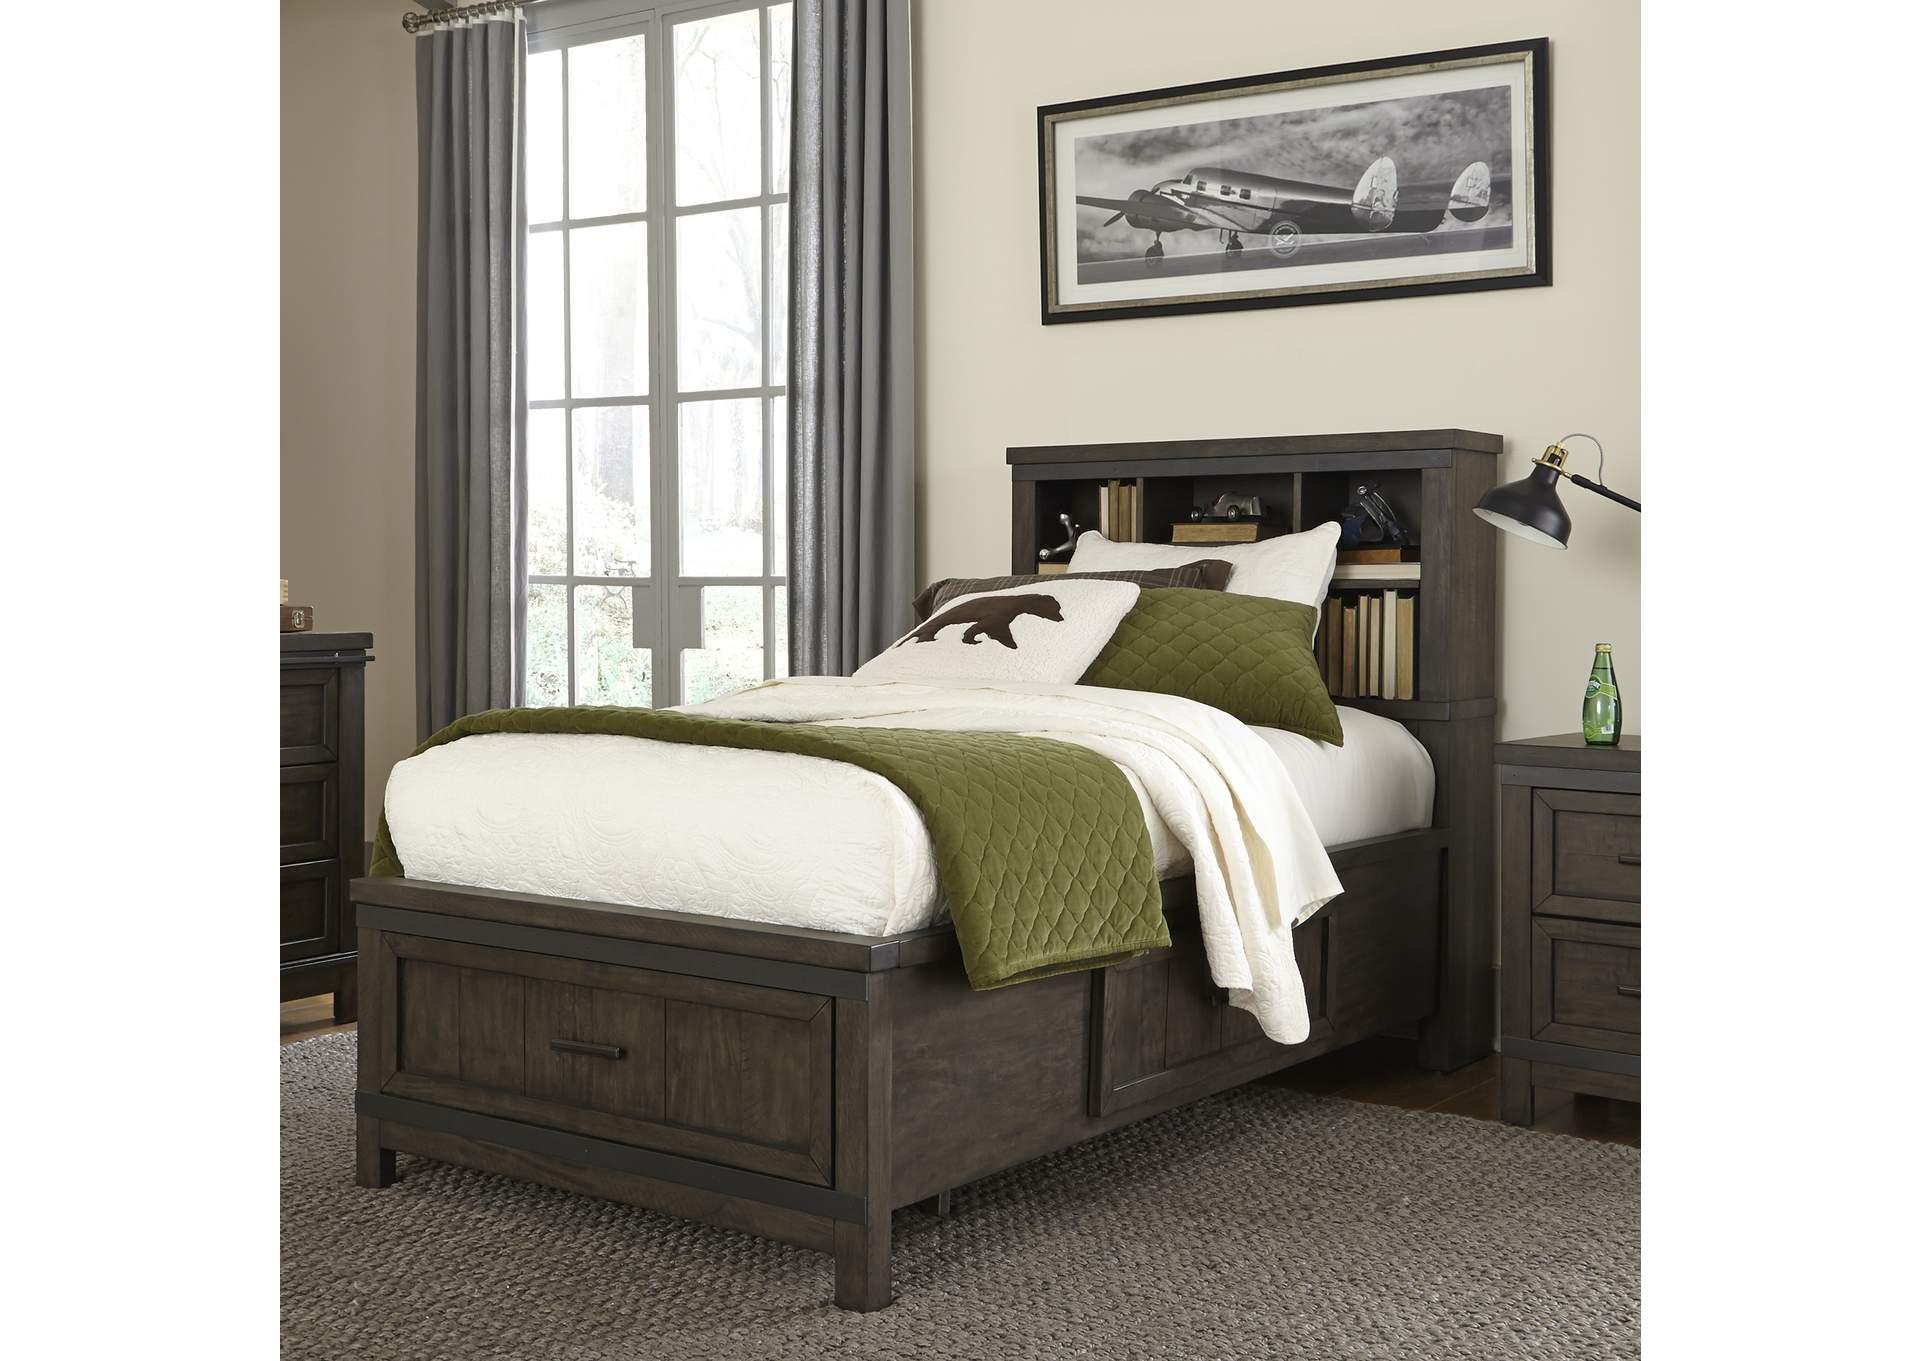 Hornell Furniture Outlet Thornwood Hills Gray Full Storage